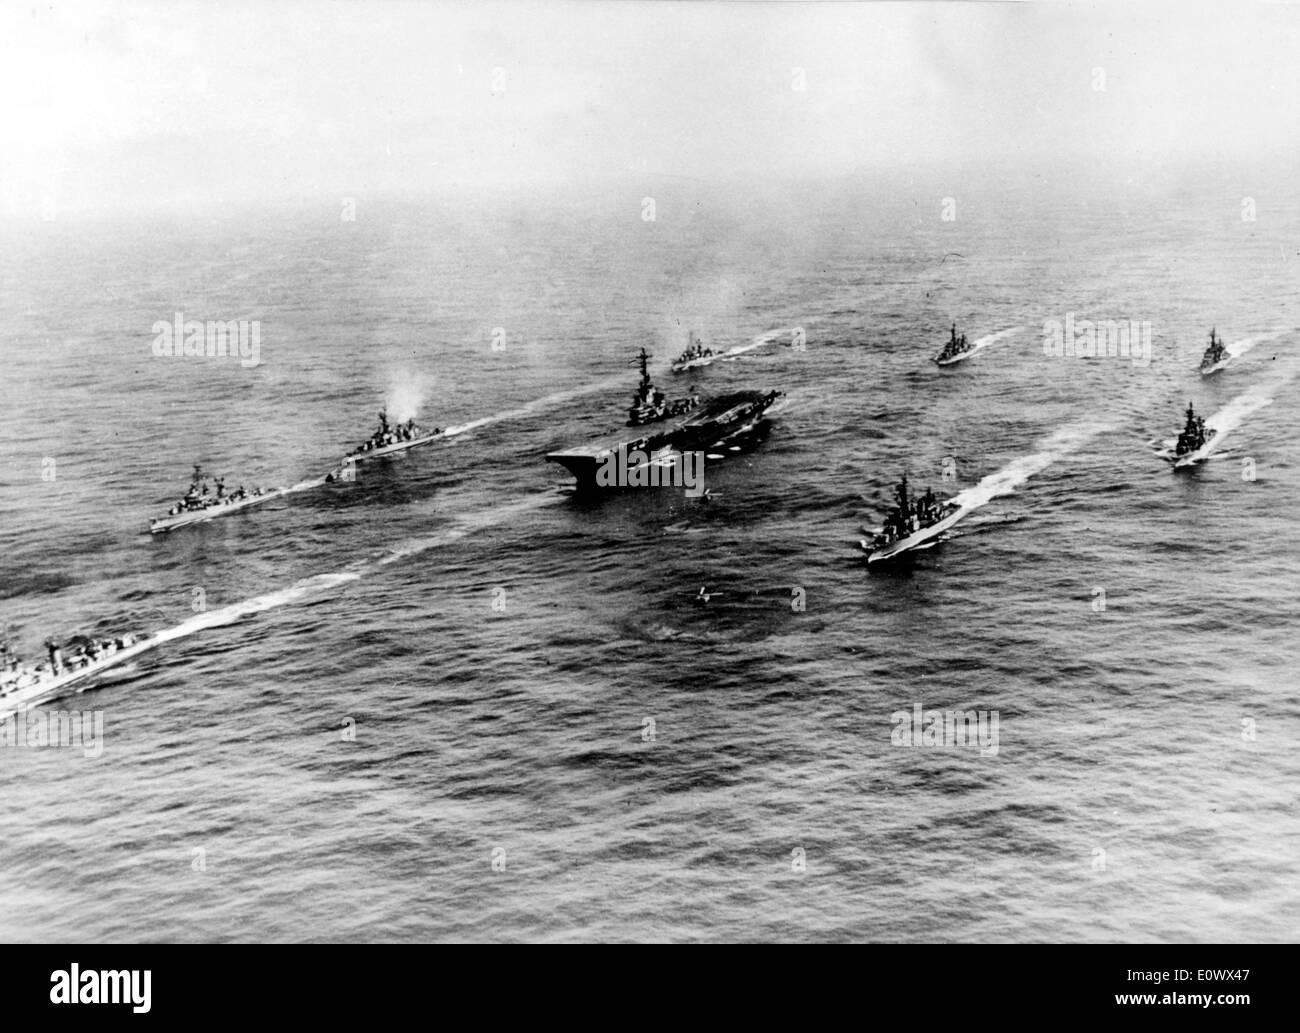 Vessels headed to fight in Gulf of Tonkin - Stock Image